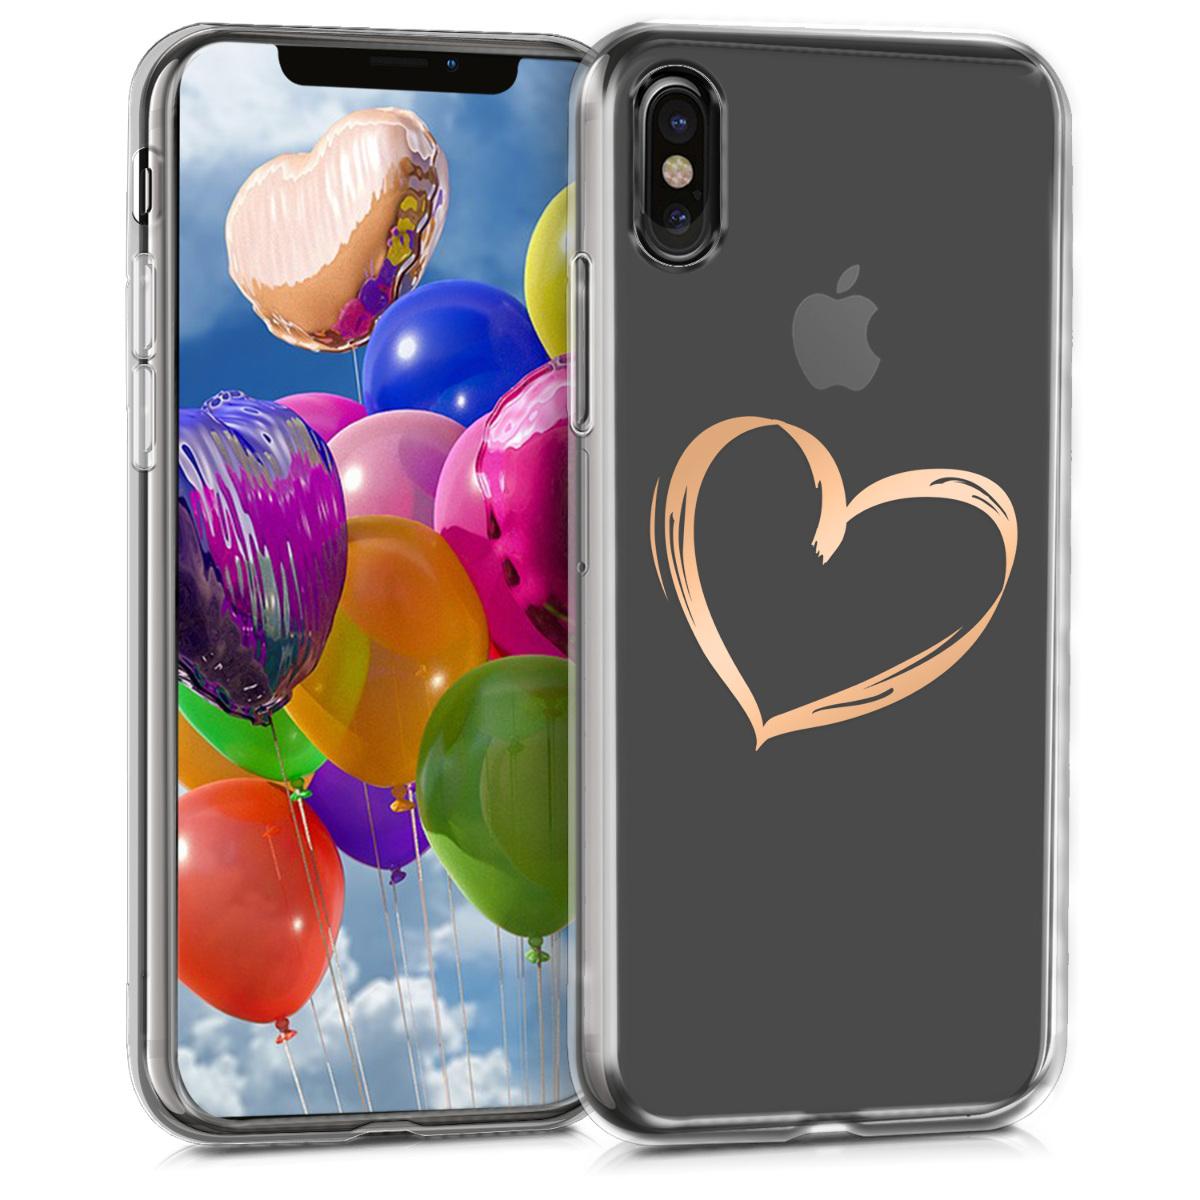 Kvalitní silikonové TPU pouzdro pro Apple iPhone X - Brushed Heart Rose Gold | Transparent